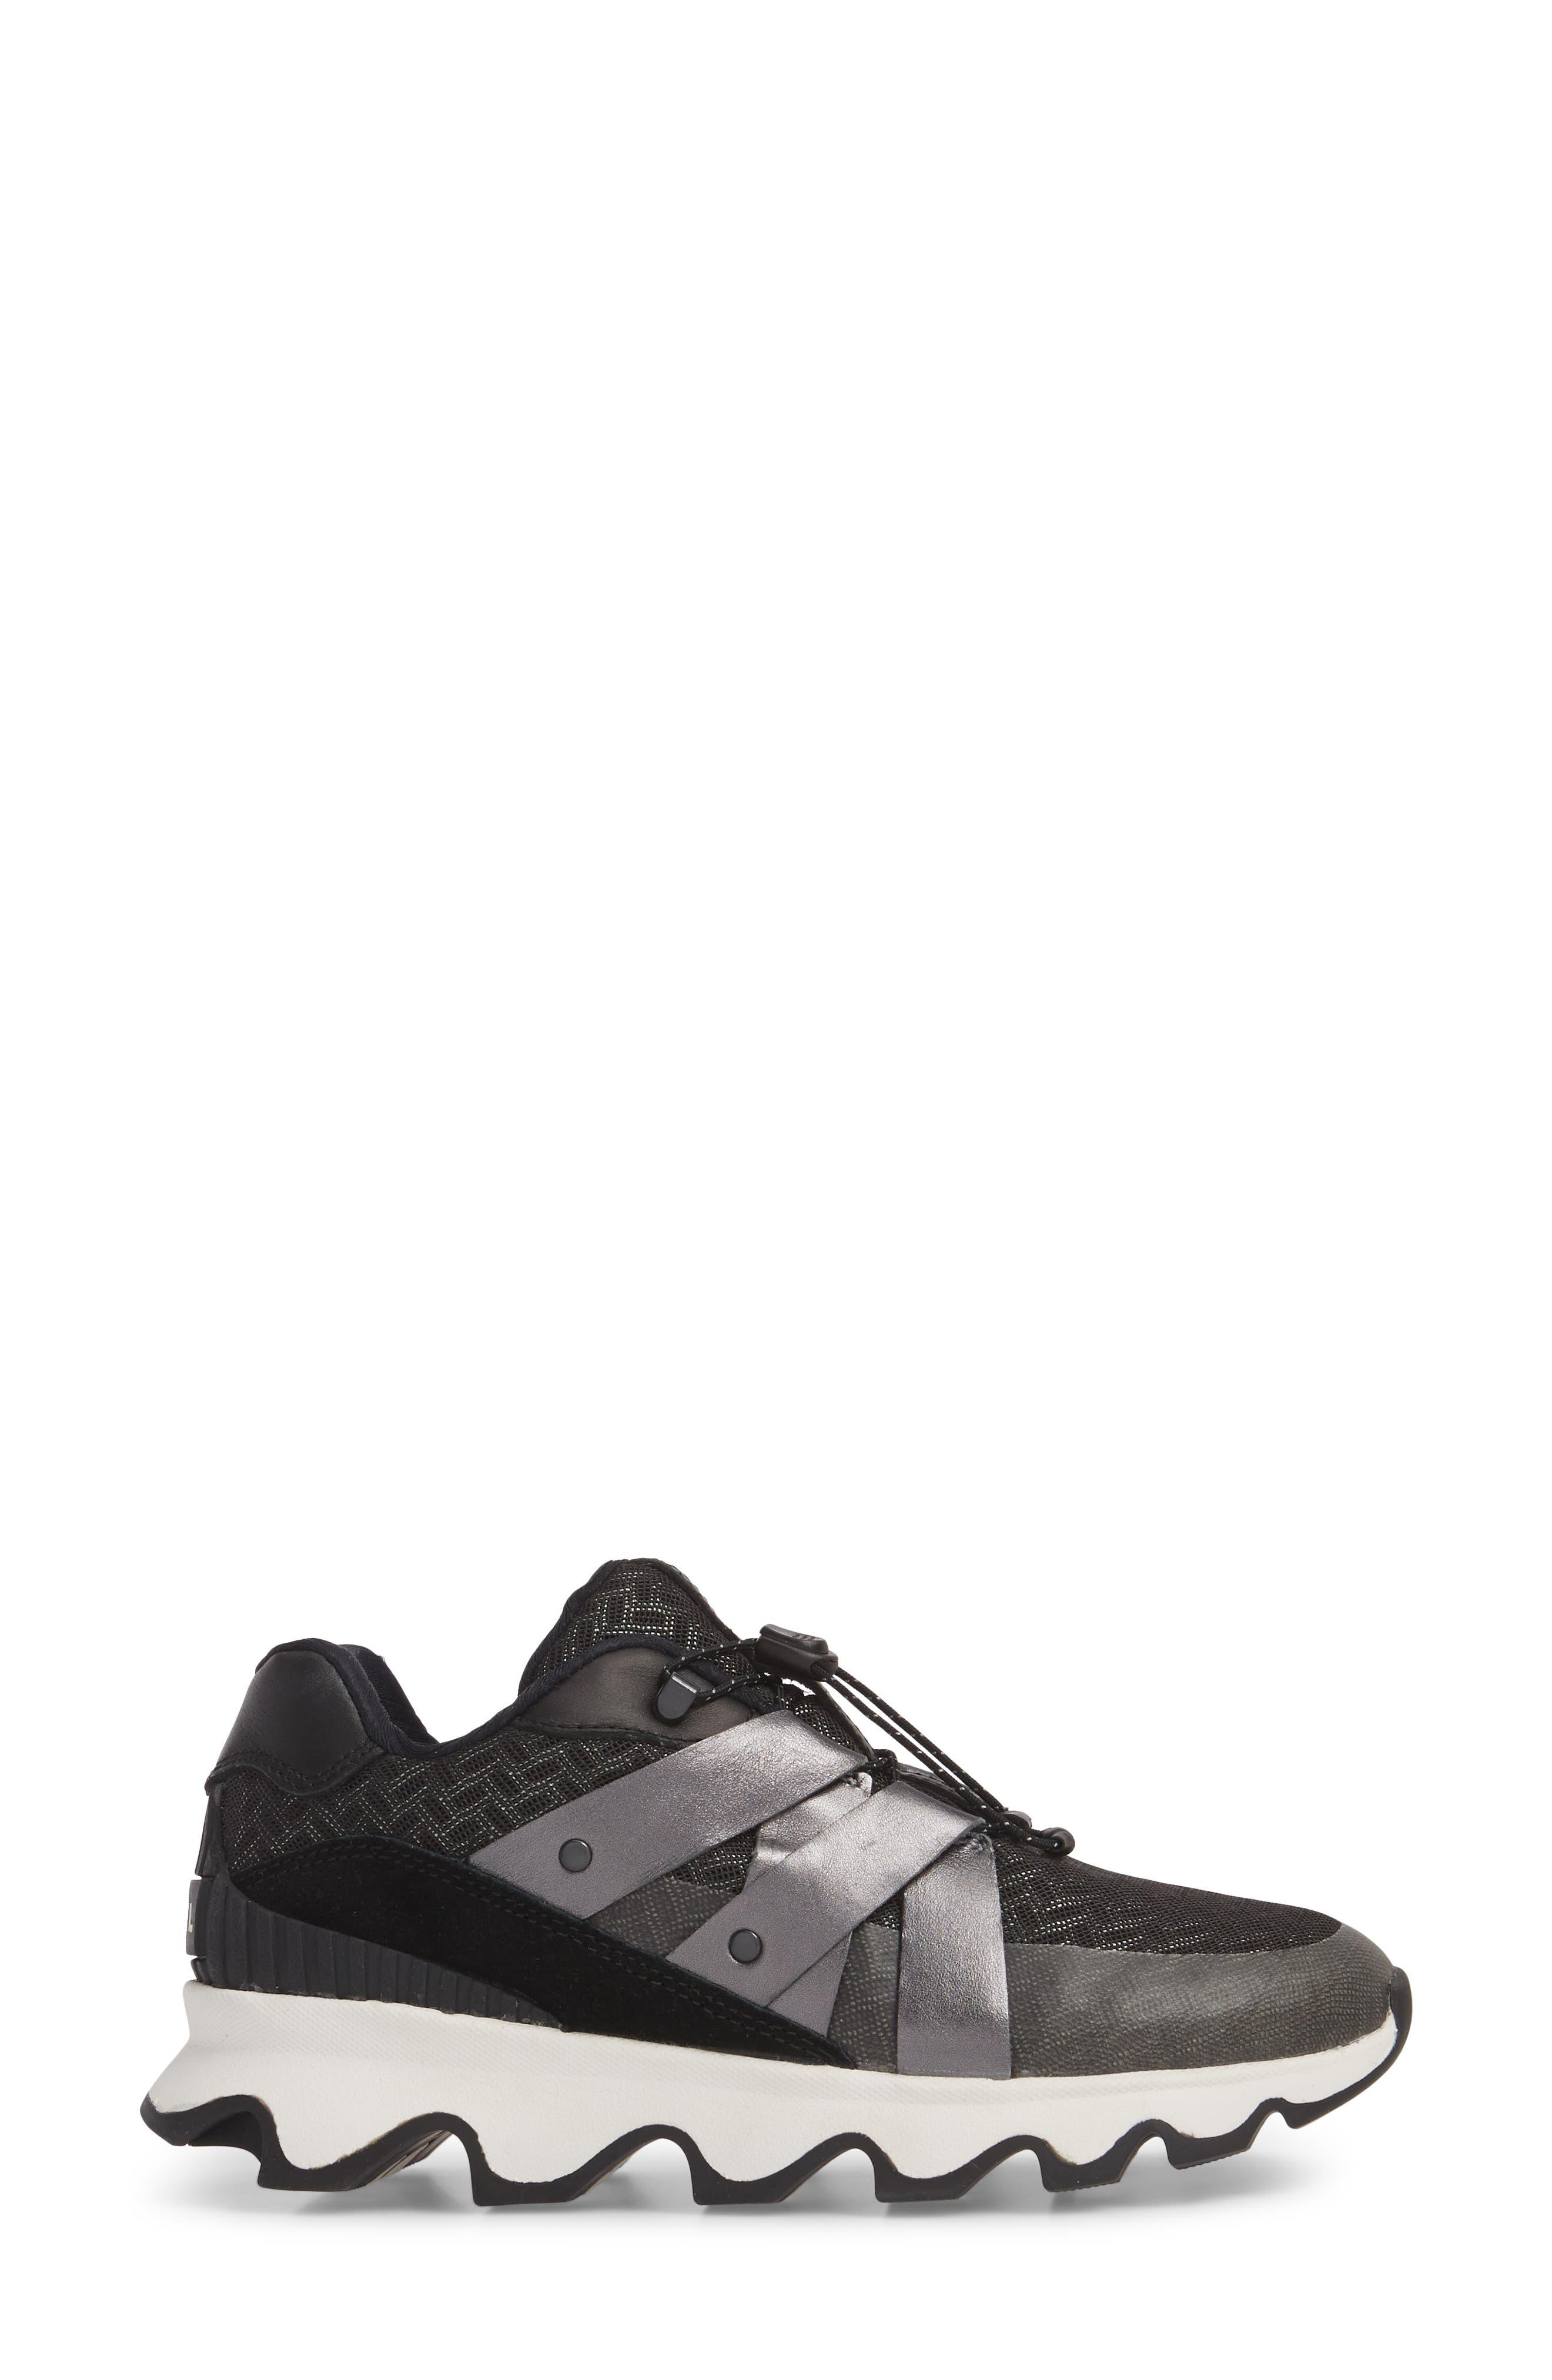 Kinetic Speed Sneaker,                             Alternate thumbnail 3, color,                             Black/ Sea Salt